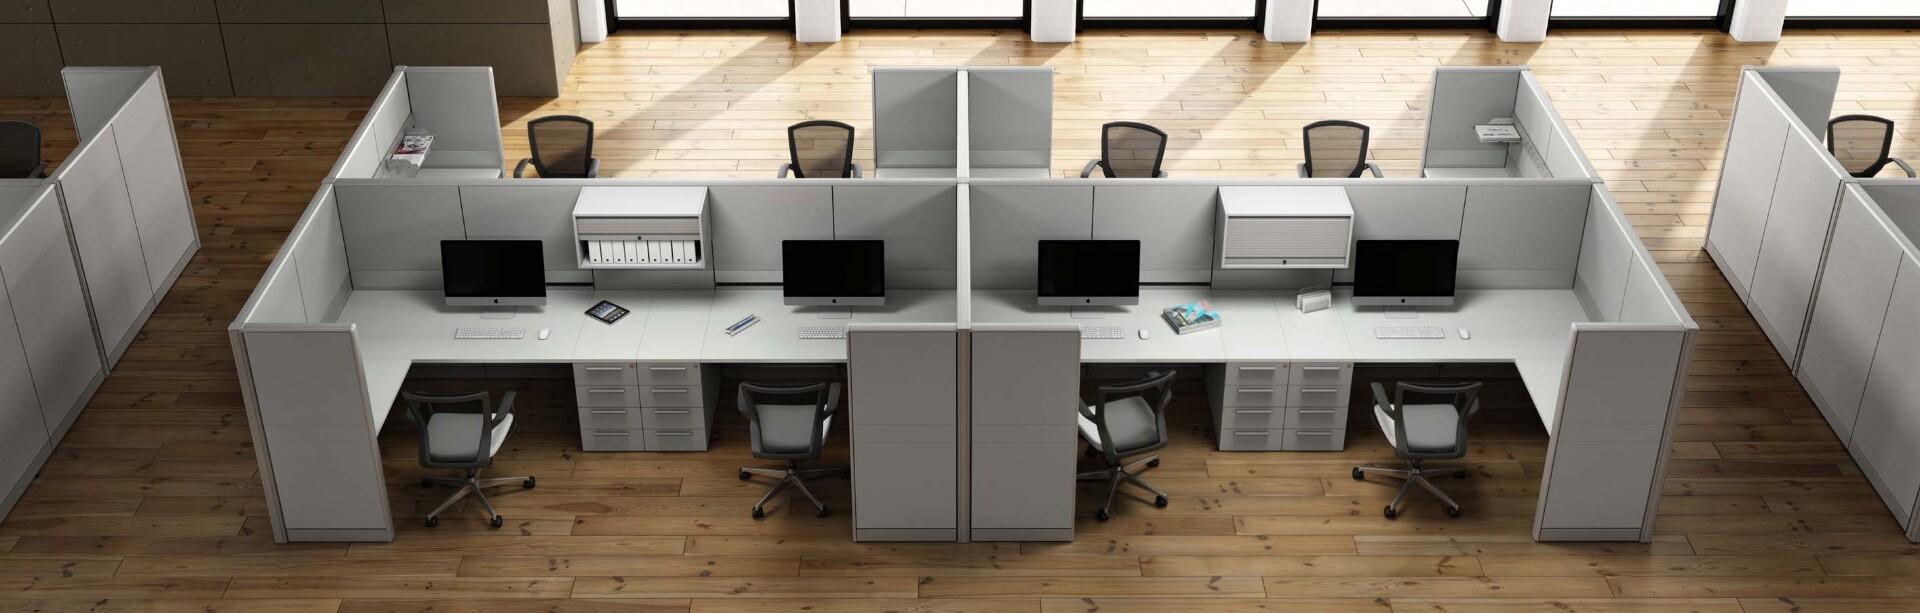 kubi-panel-desking-system-open-space-partition-05.jpg